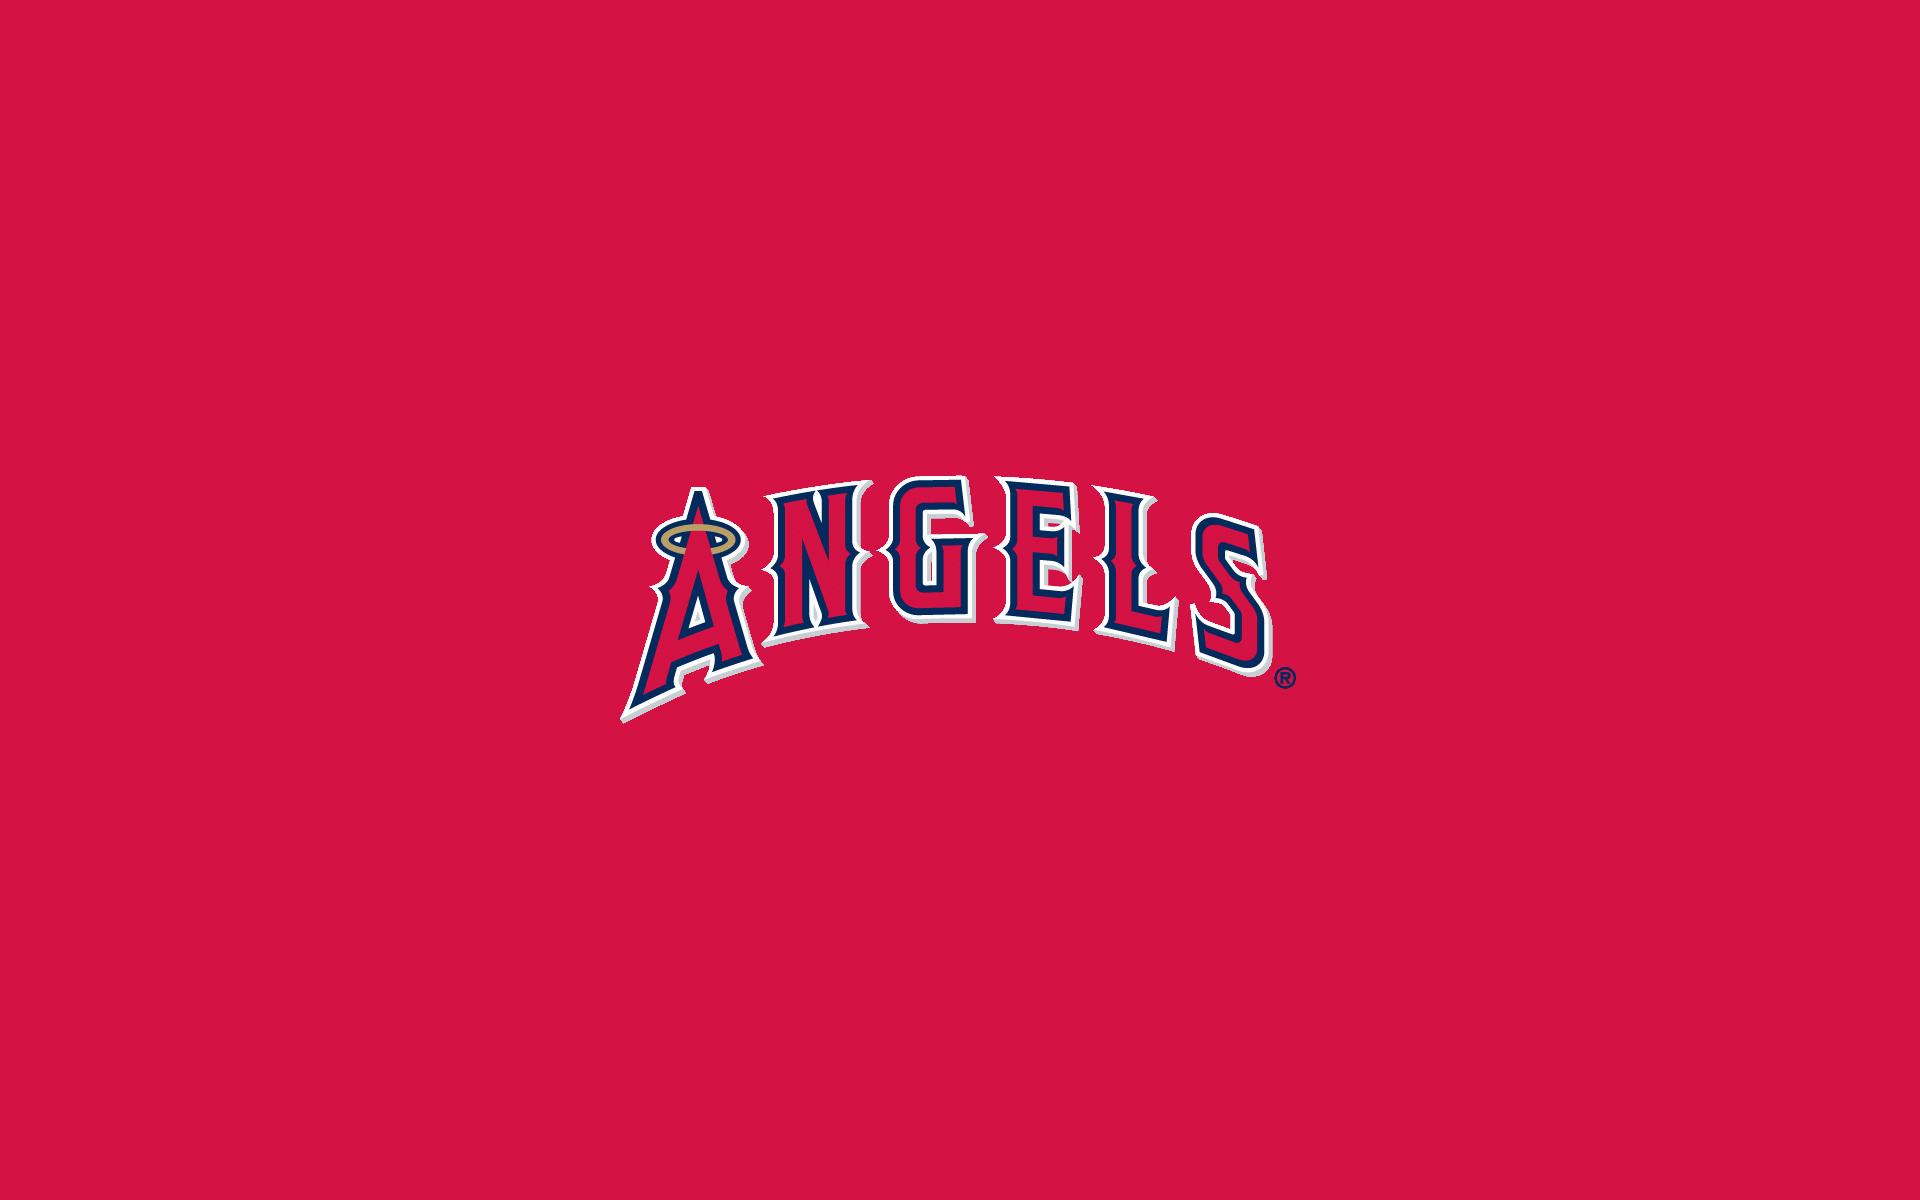 ANAHEIM ANGELS baseball mlb g wallpaper 1920x1200 158469 1920x1200